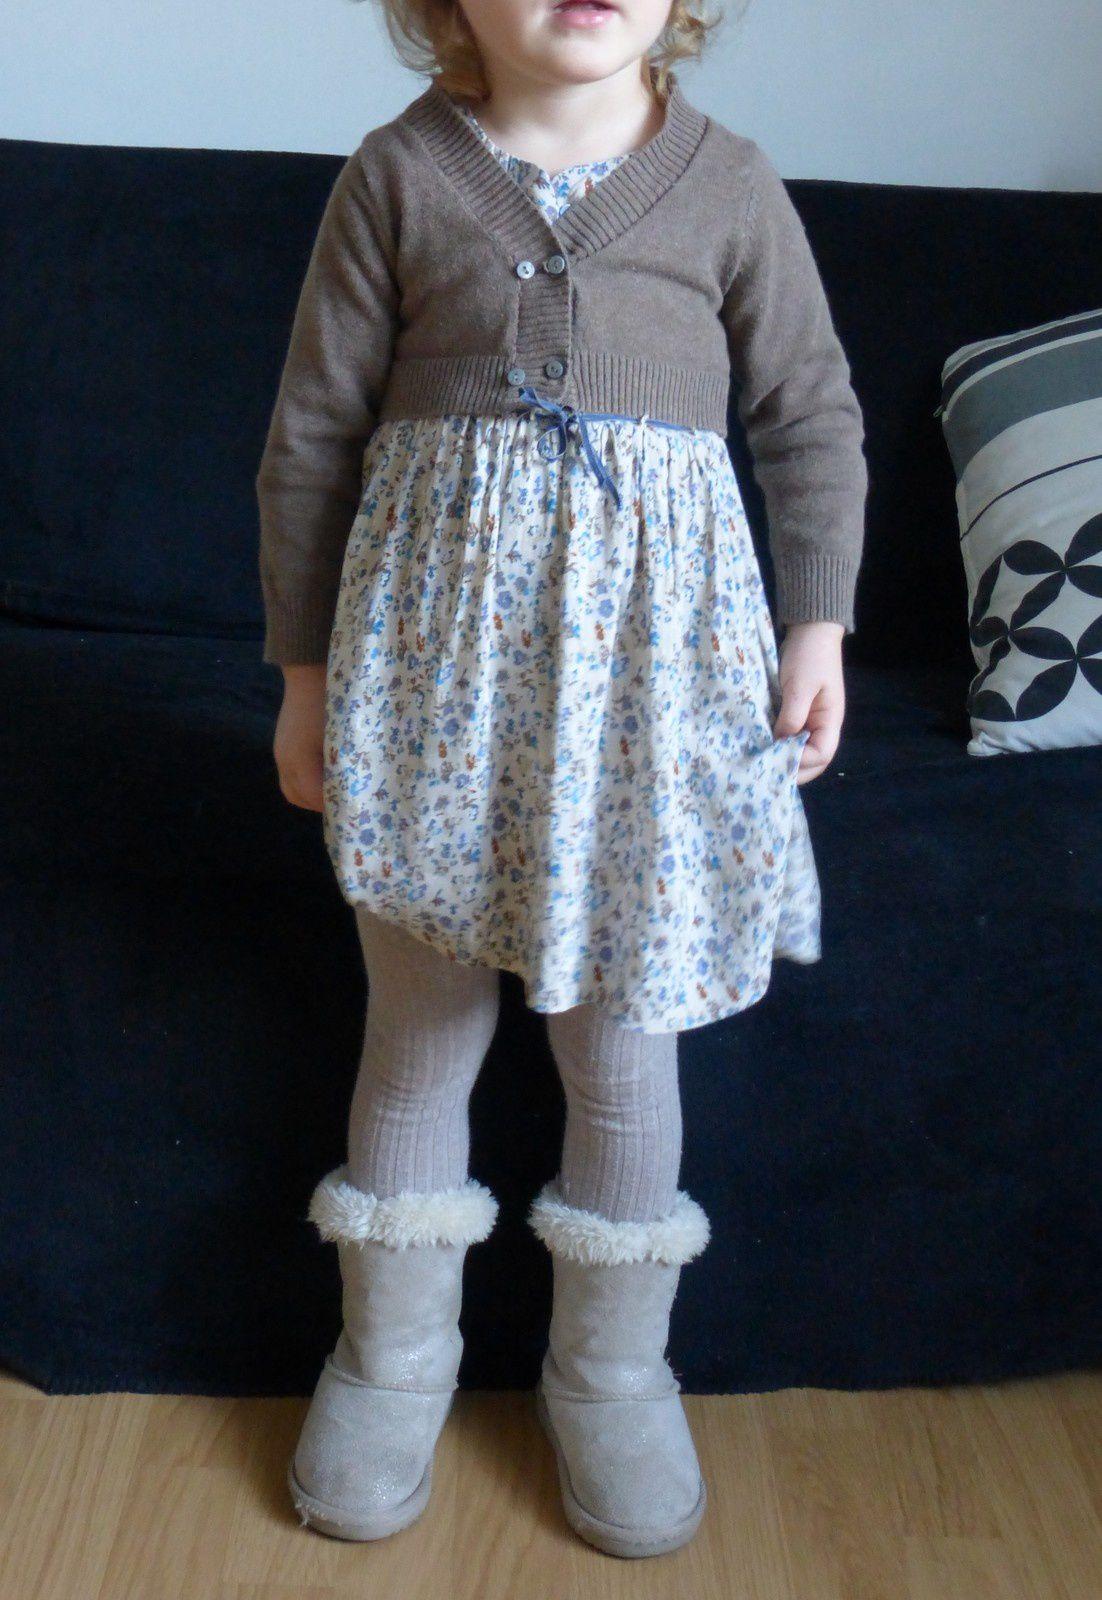 Petite robe à fleurs